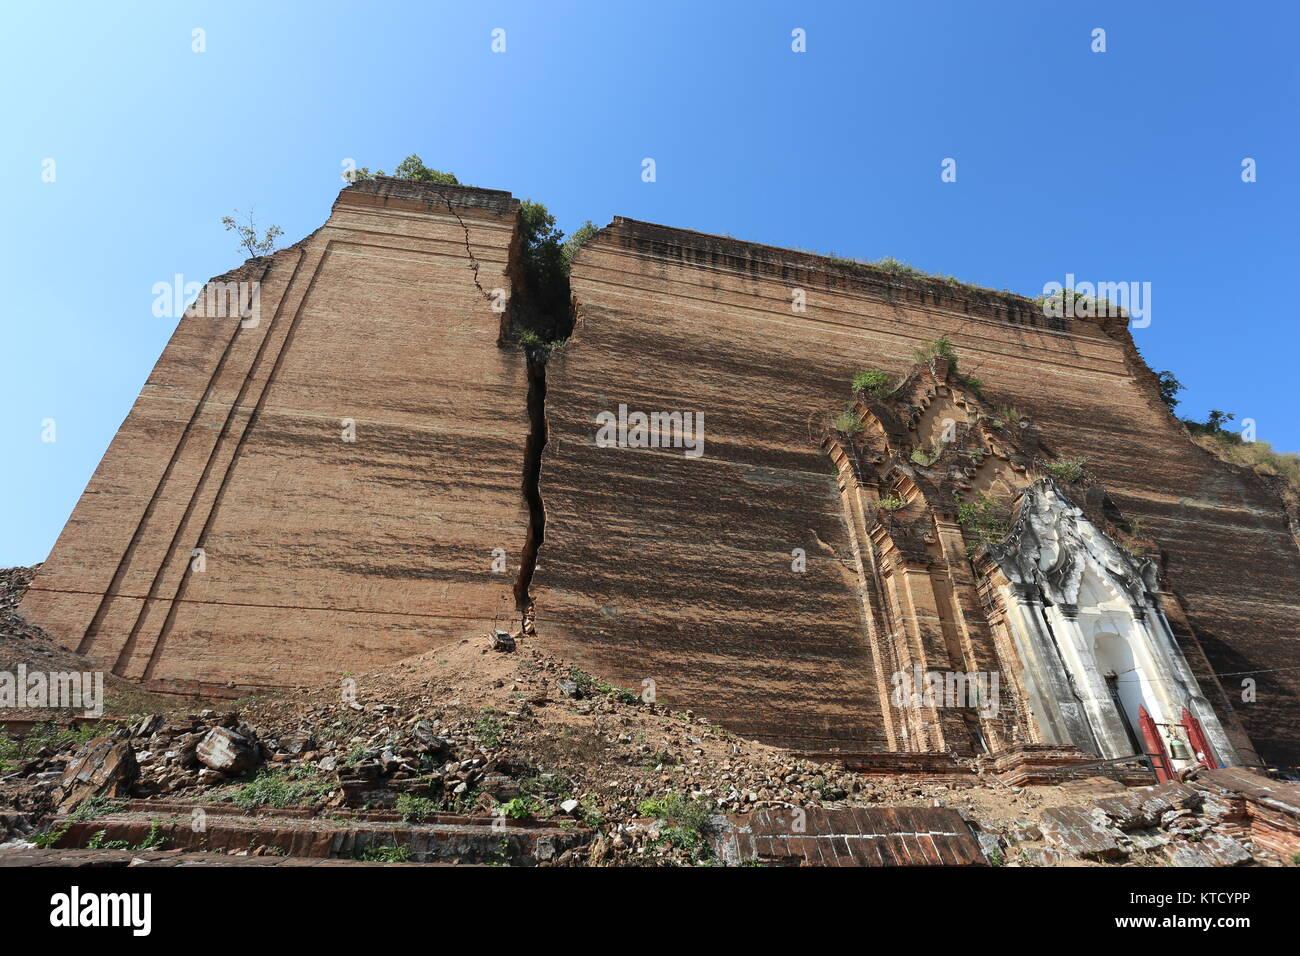 The unfinished Stupa of Mingun (Pahtodawgyi), aka the largest pile of bricks, was left incomplete by King Bodawpaya - Stock Image